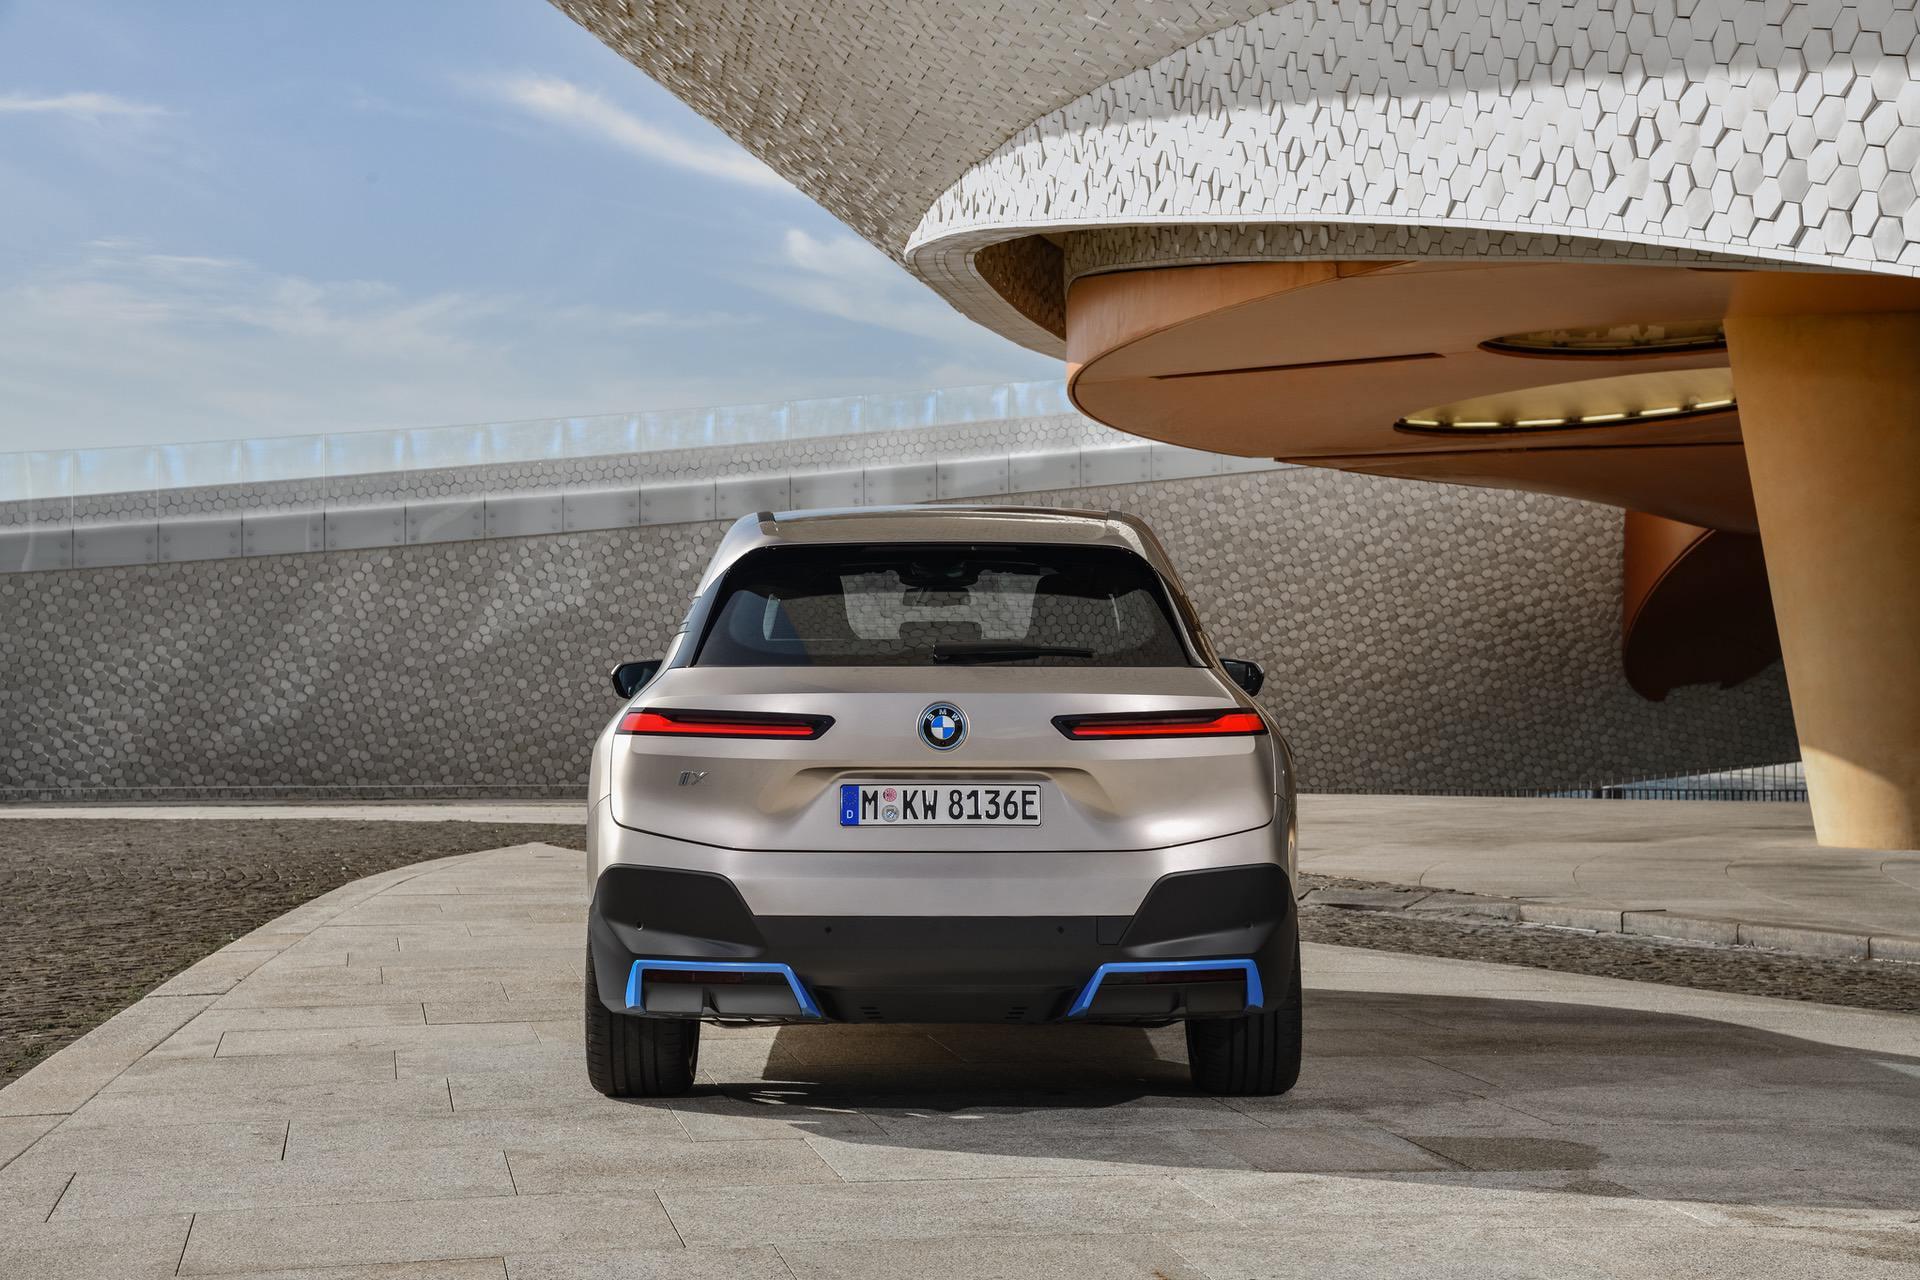 2022-bmw-ix-exterior-00.jpg